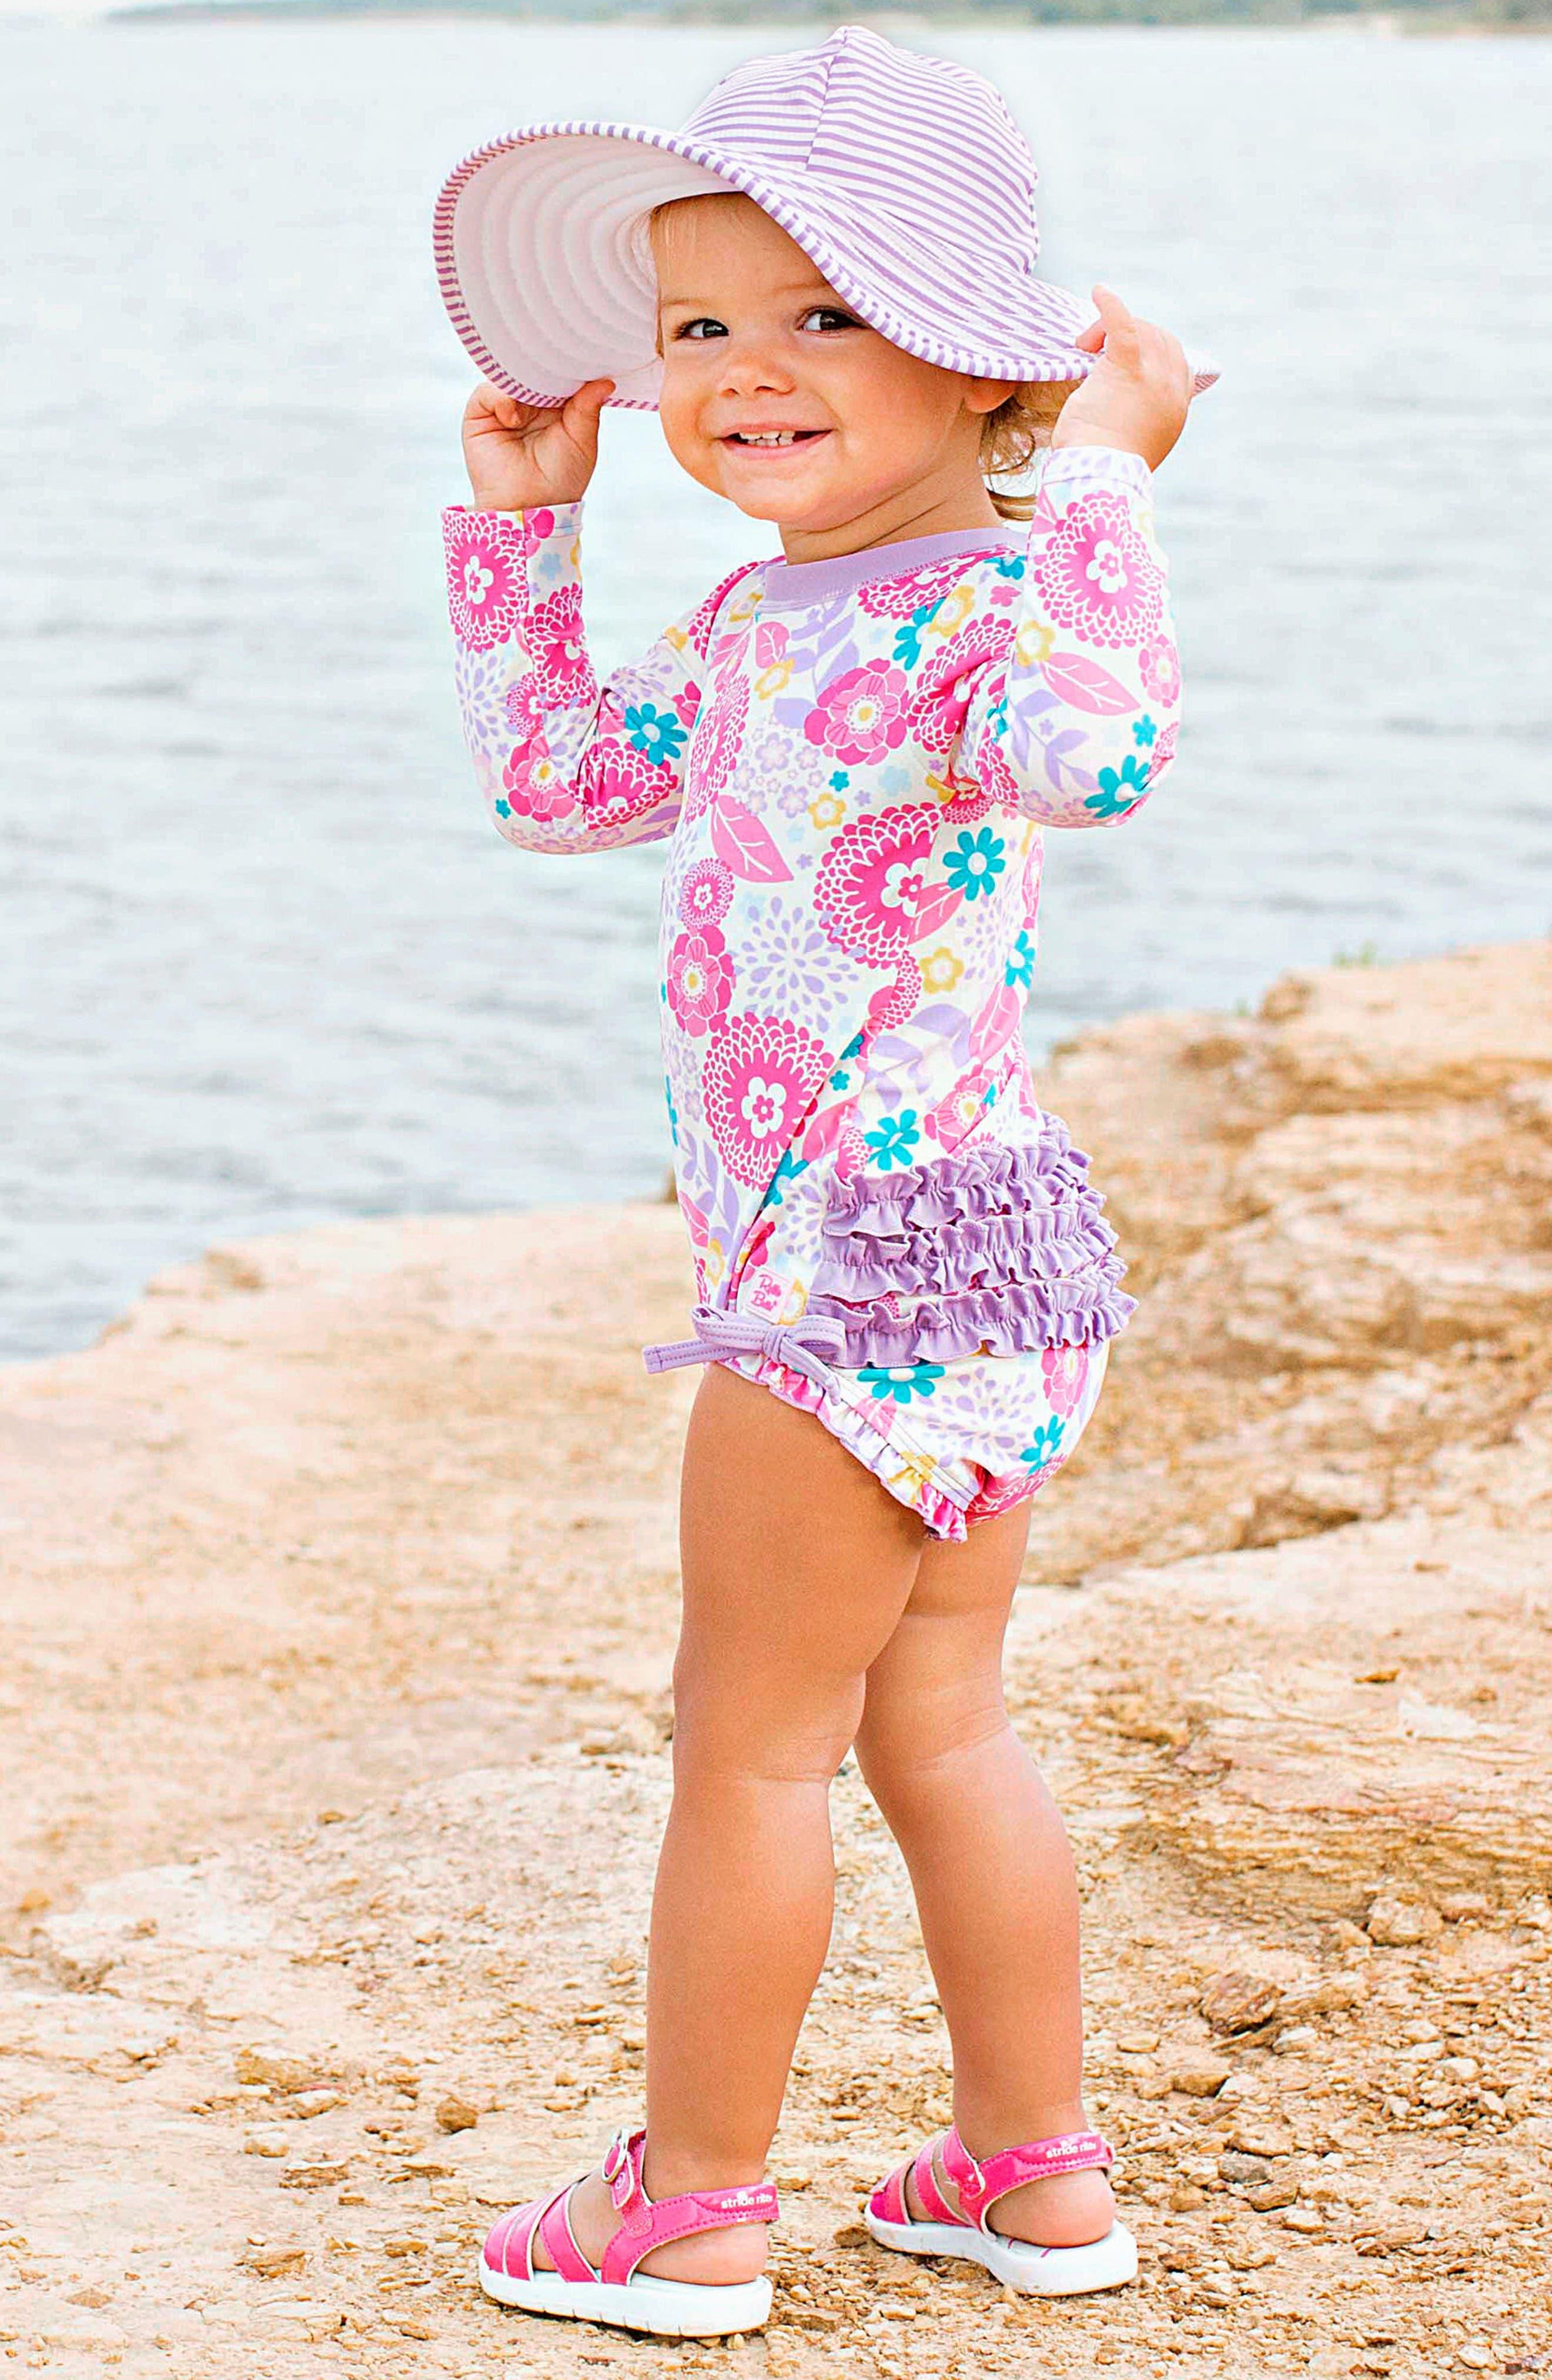 Alternate Image 3  - RuffleButts Blooming Buttercups One-Piece Rashguard Swimsuit & Hat Set (Baby Girls)